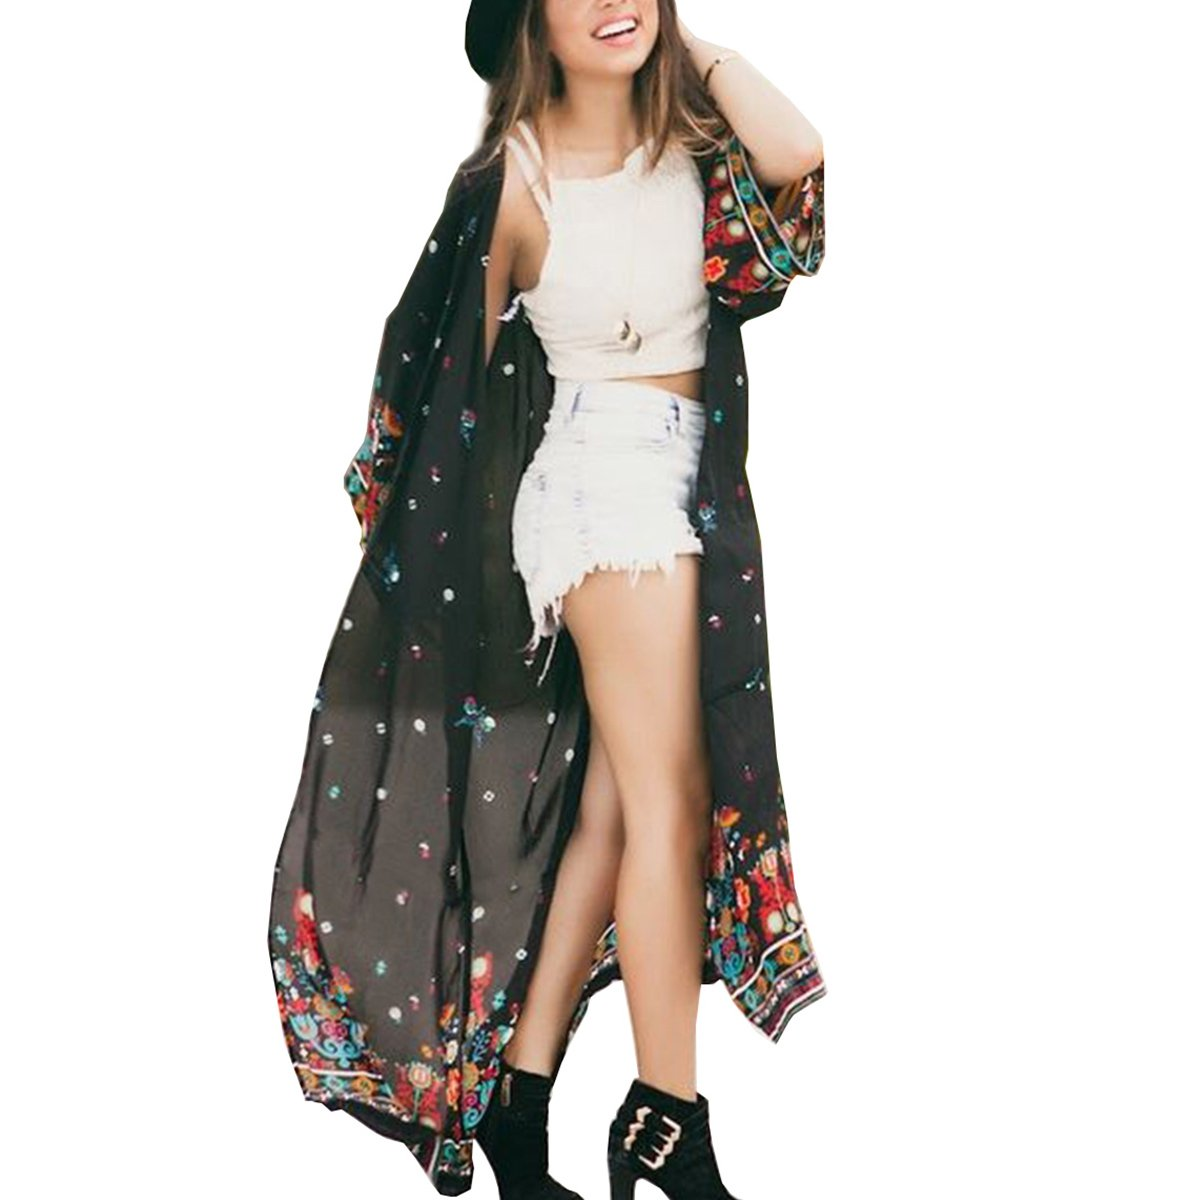 BB&KK Women's Floral Print Boho Style Beach Wear Lightweight Cover up Tops Kimono Cardigan 2XL